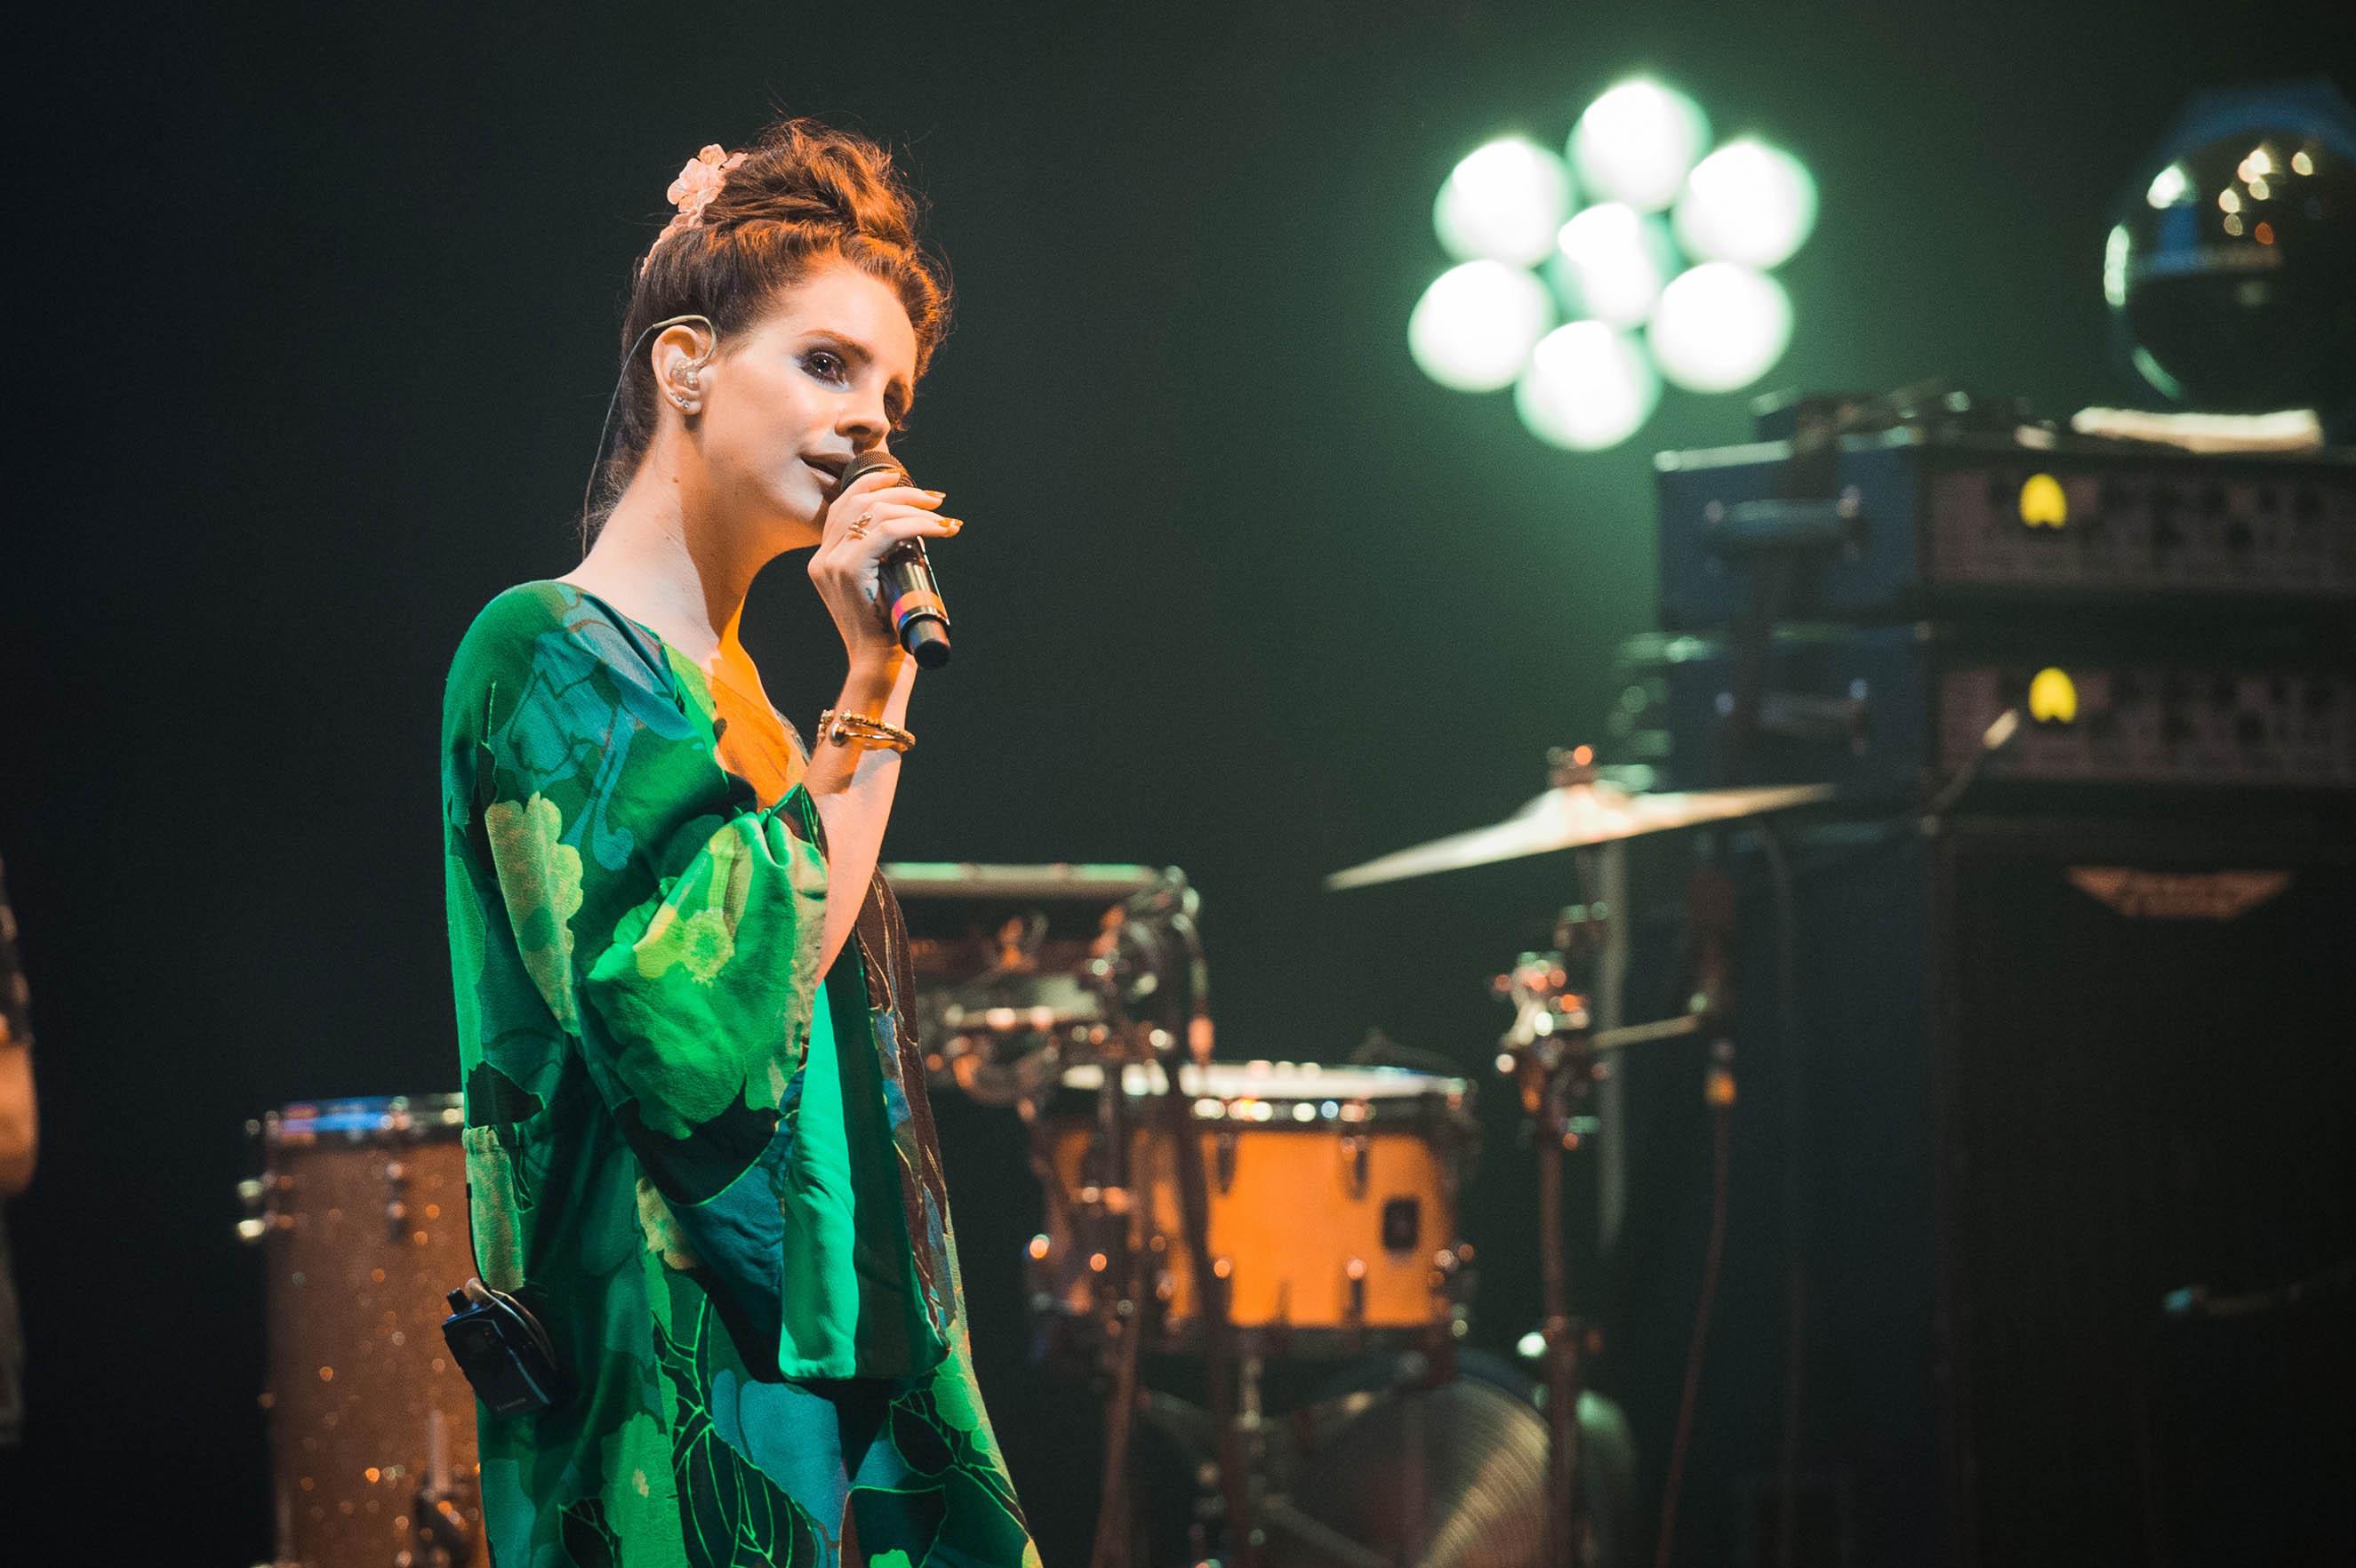 On her third album, out now, Del Rey is still pop's most polarizing flower child